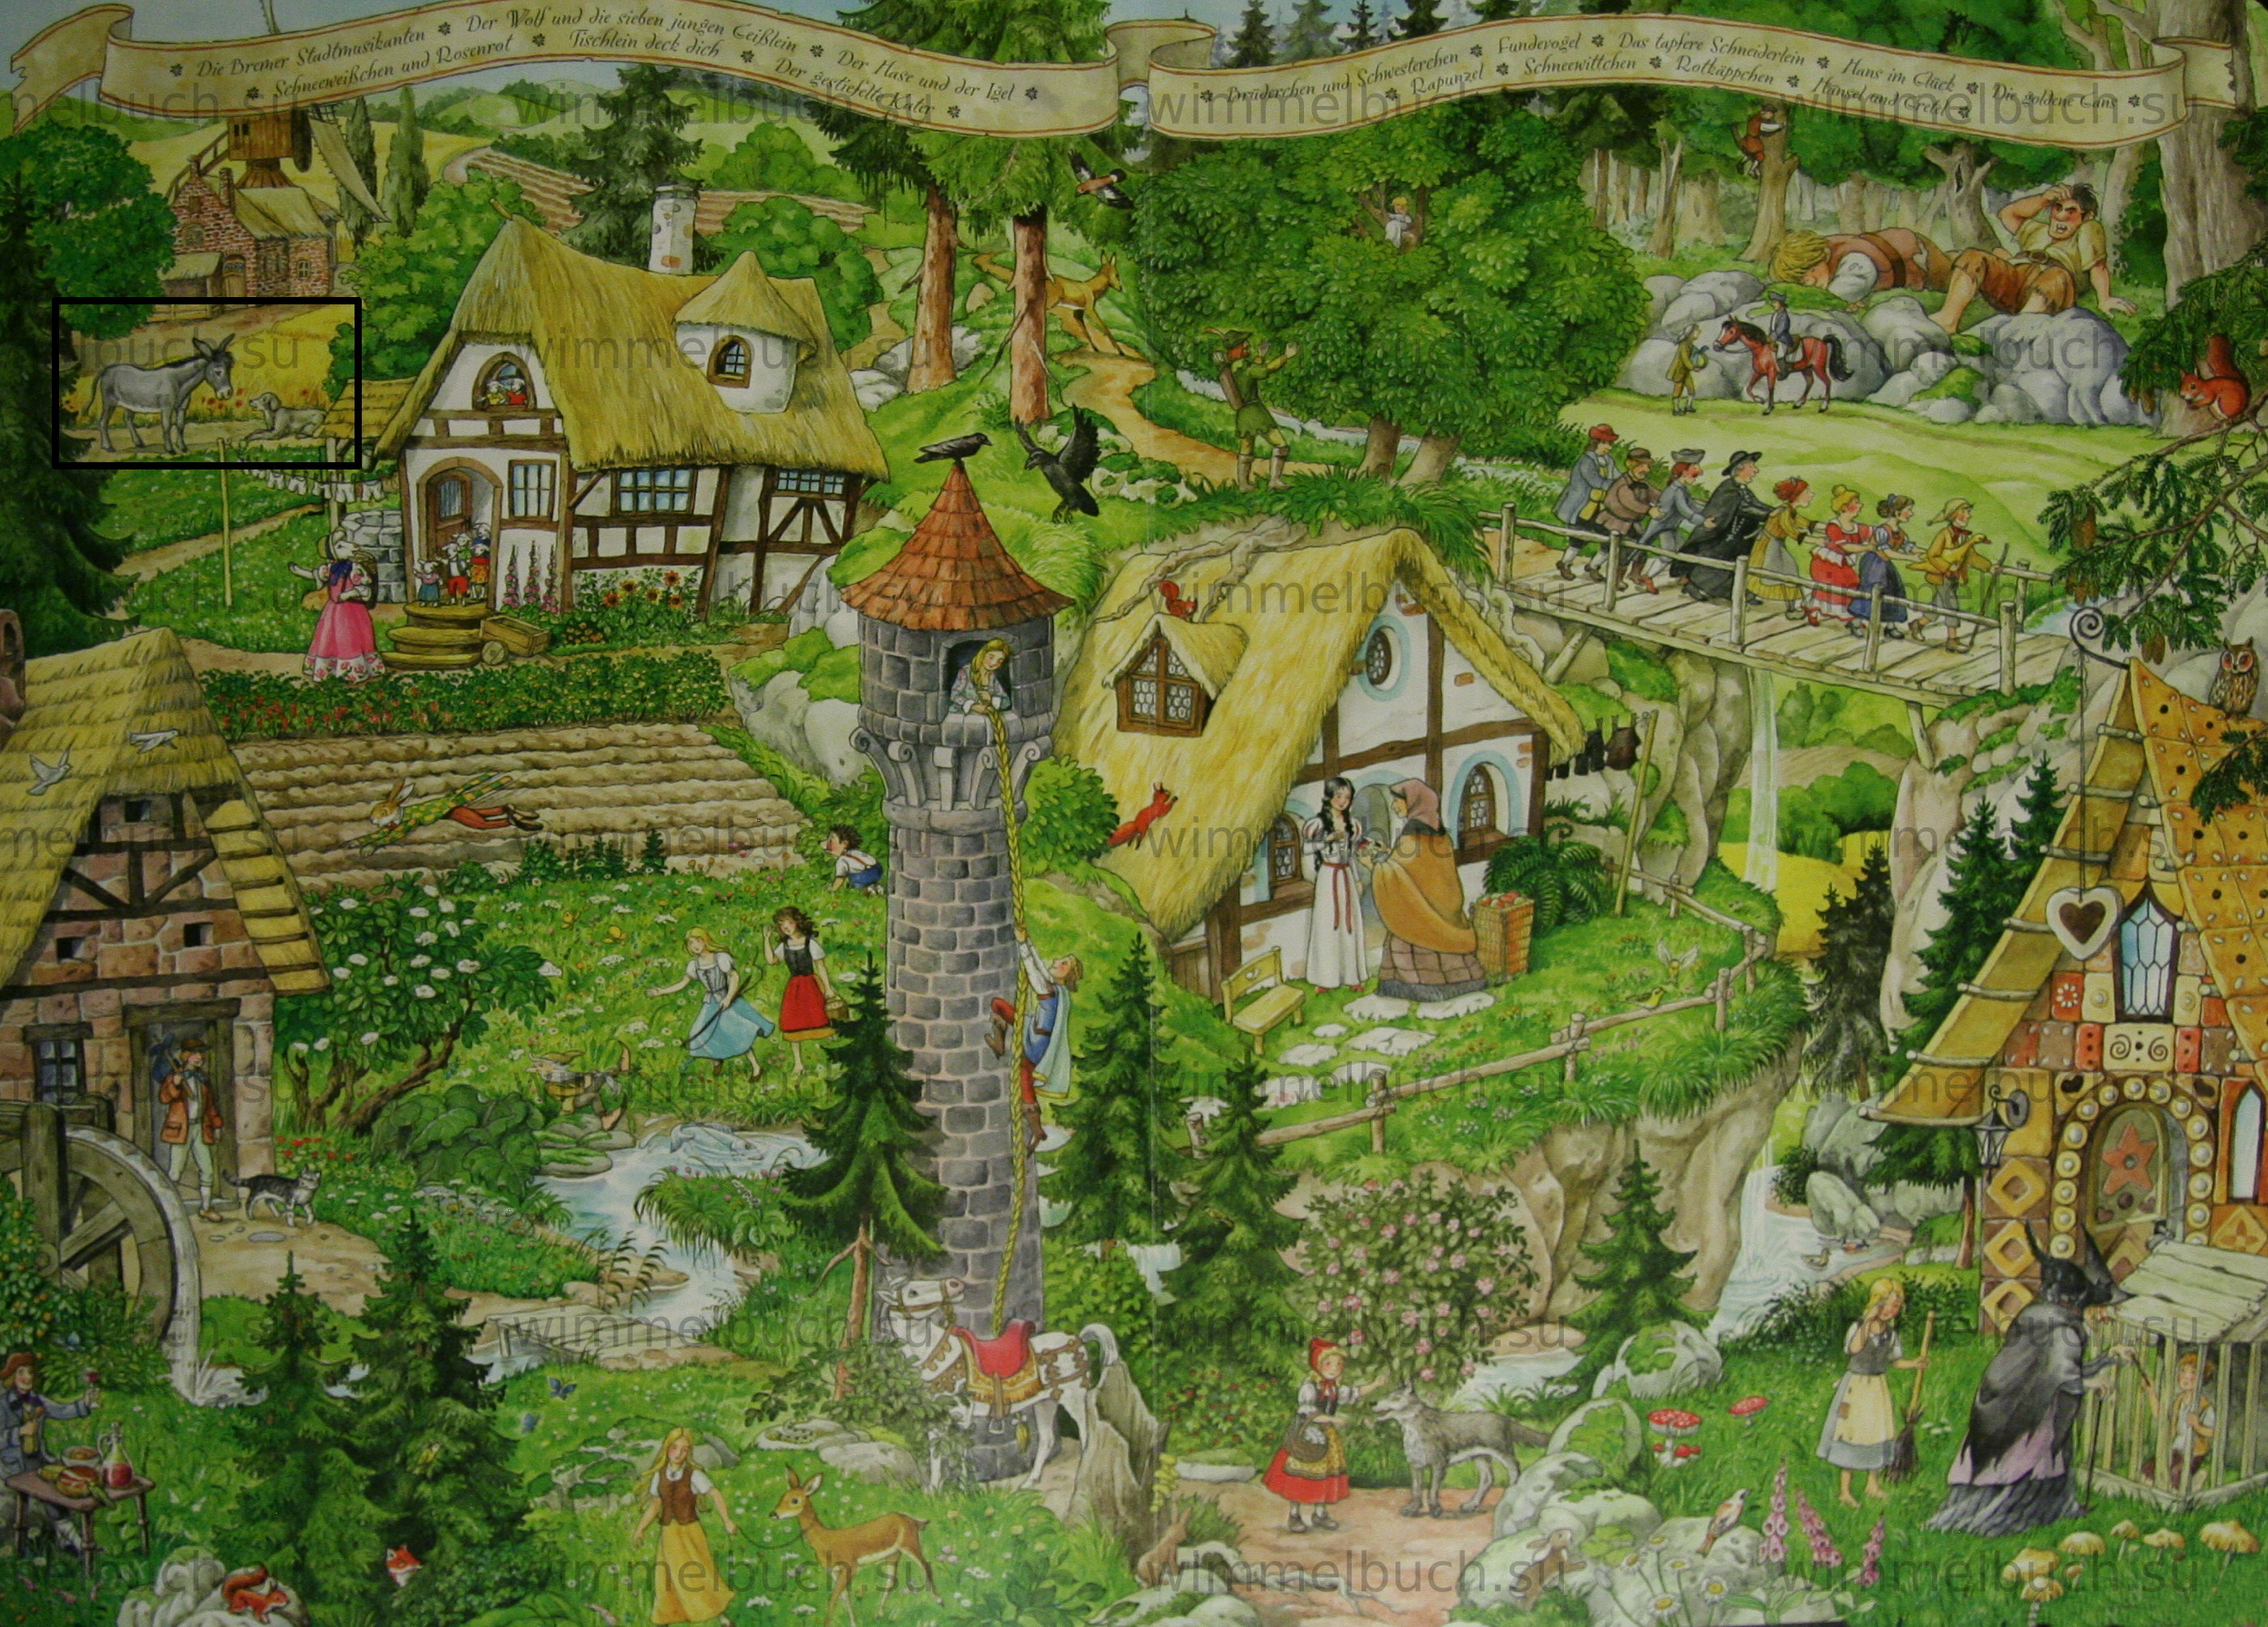 Бременские музыканты в Wimmelbuch Märchenland